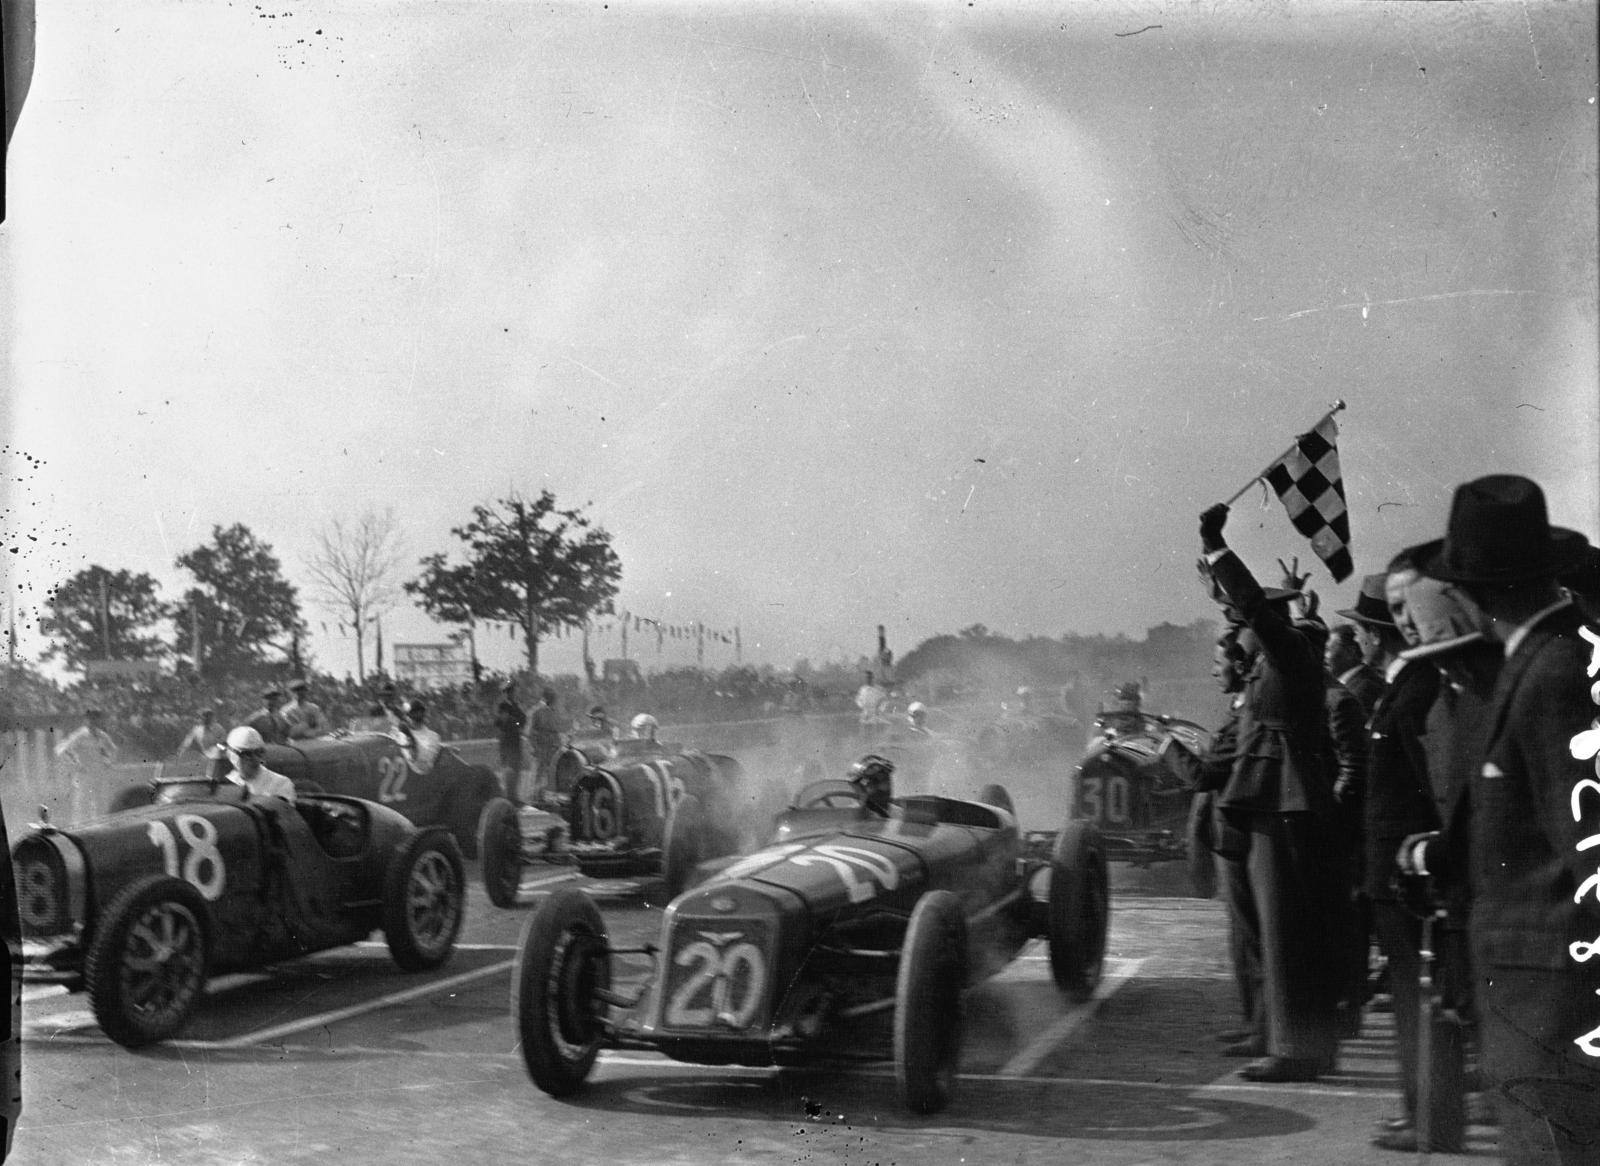 Start Velike Nagrade Italije 1931. koja je bila prva od ukupno tri utrke novog Europskog prvenstva. Slavili su Giuseppe Campari i Tazio Nuvolari u Alfa Romeu. (24.5.1931.) Foto: grandprixhistory